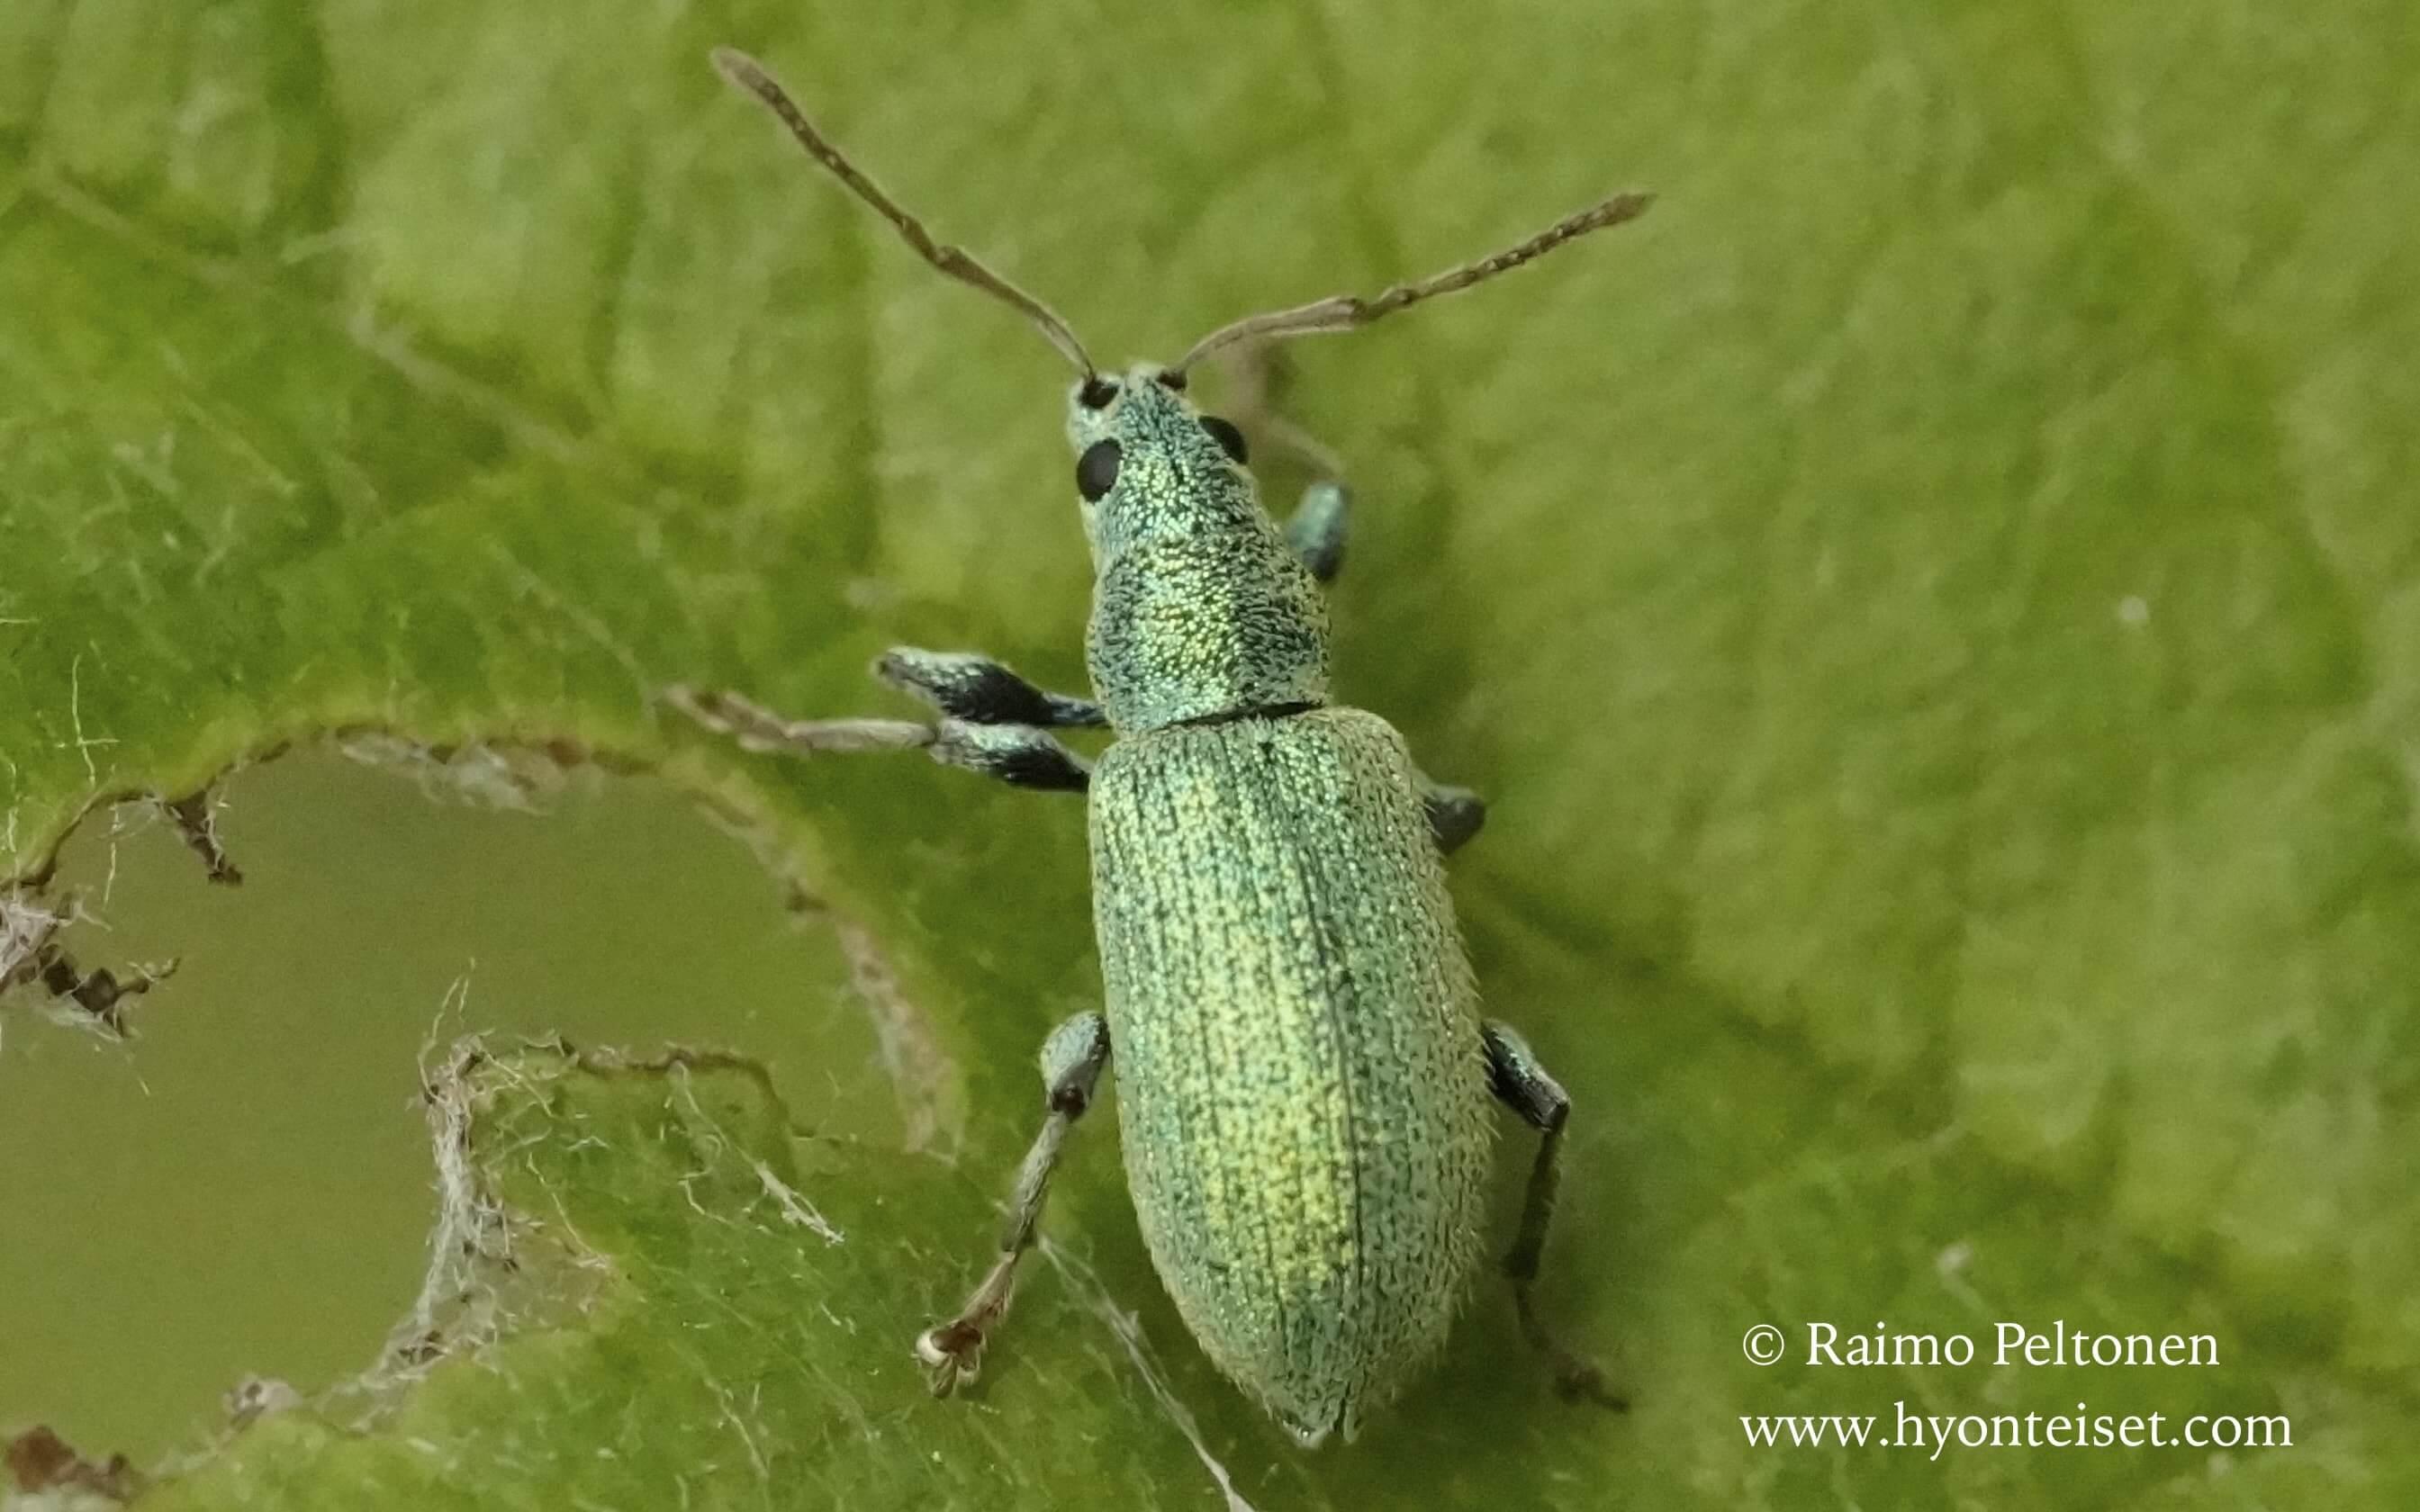 Phyllobius argentatus-viherlehtikärsäkäs